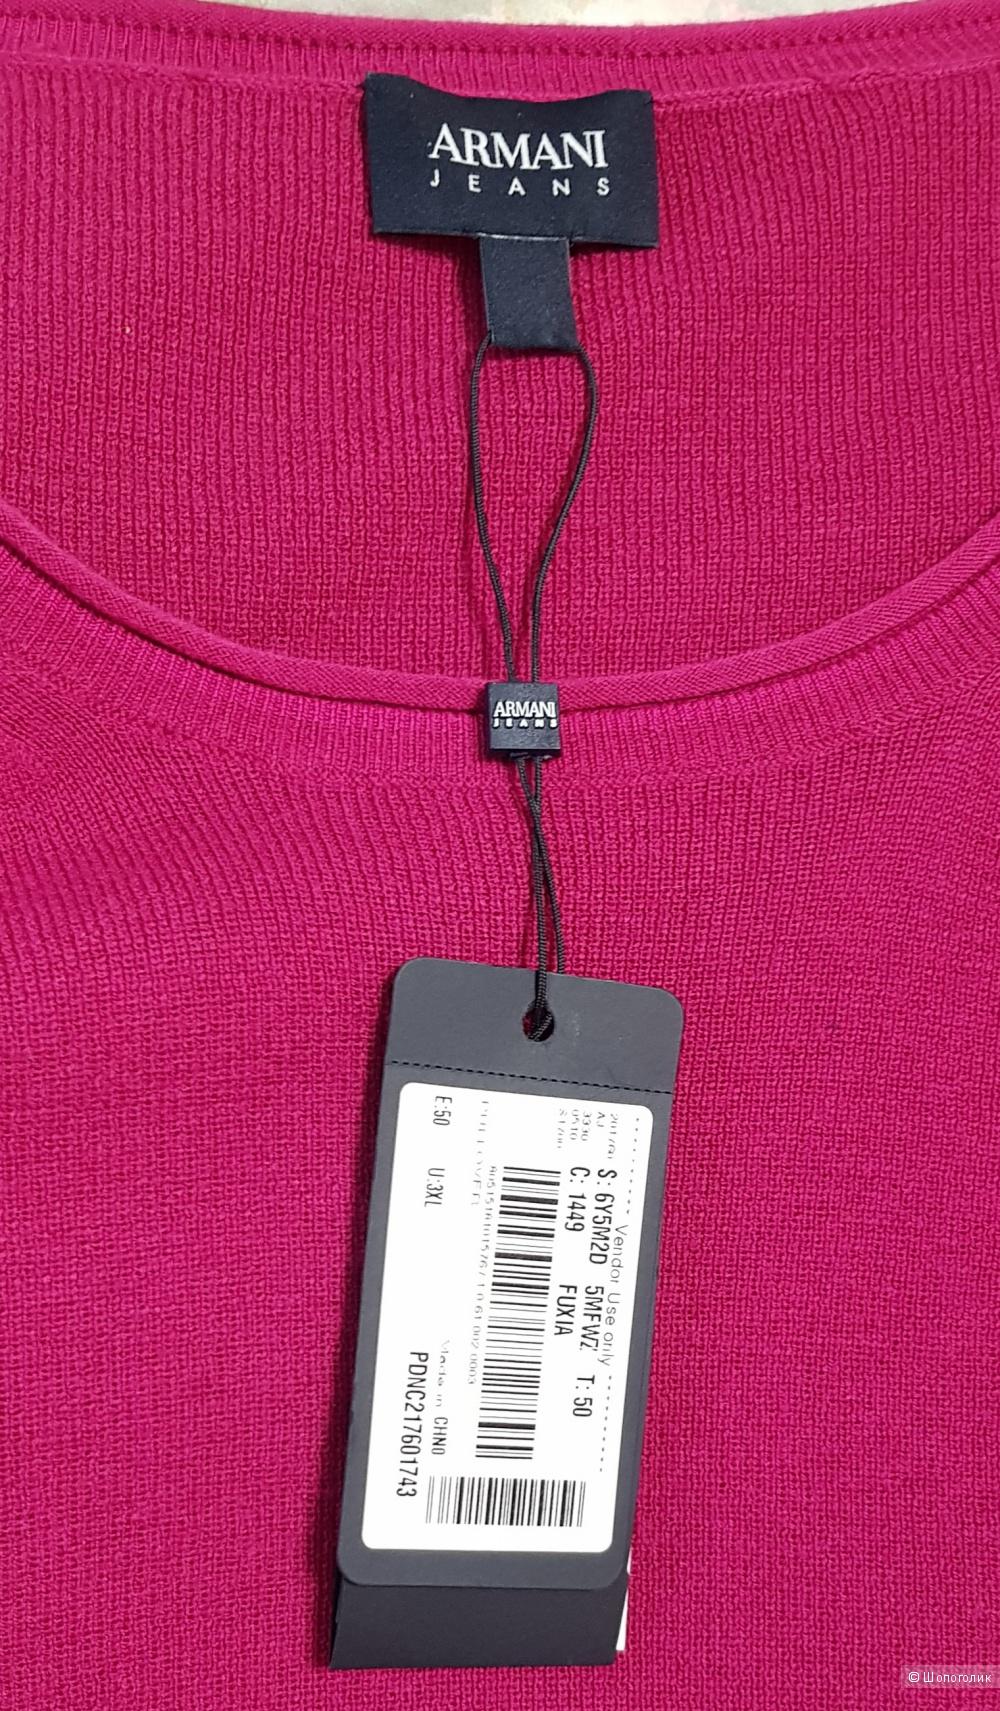 Джемпер Armani Jeans, 52 размер